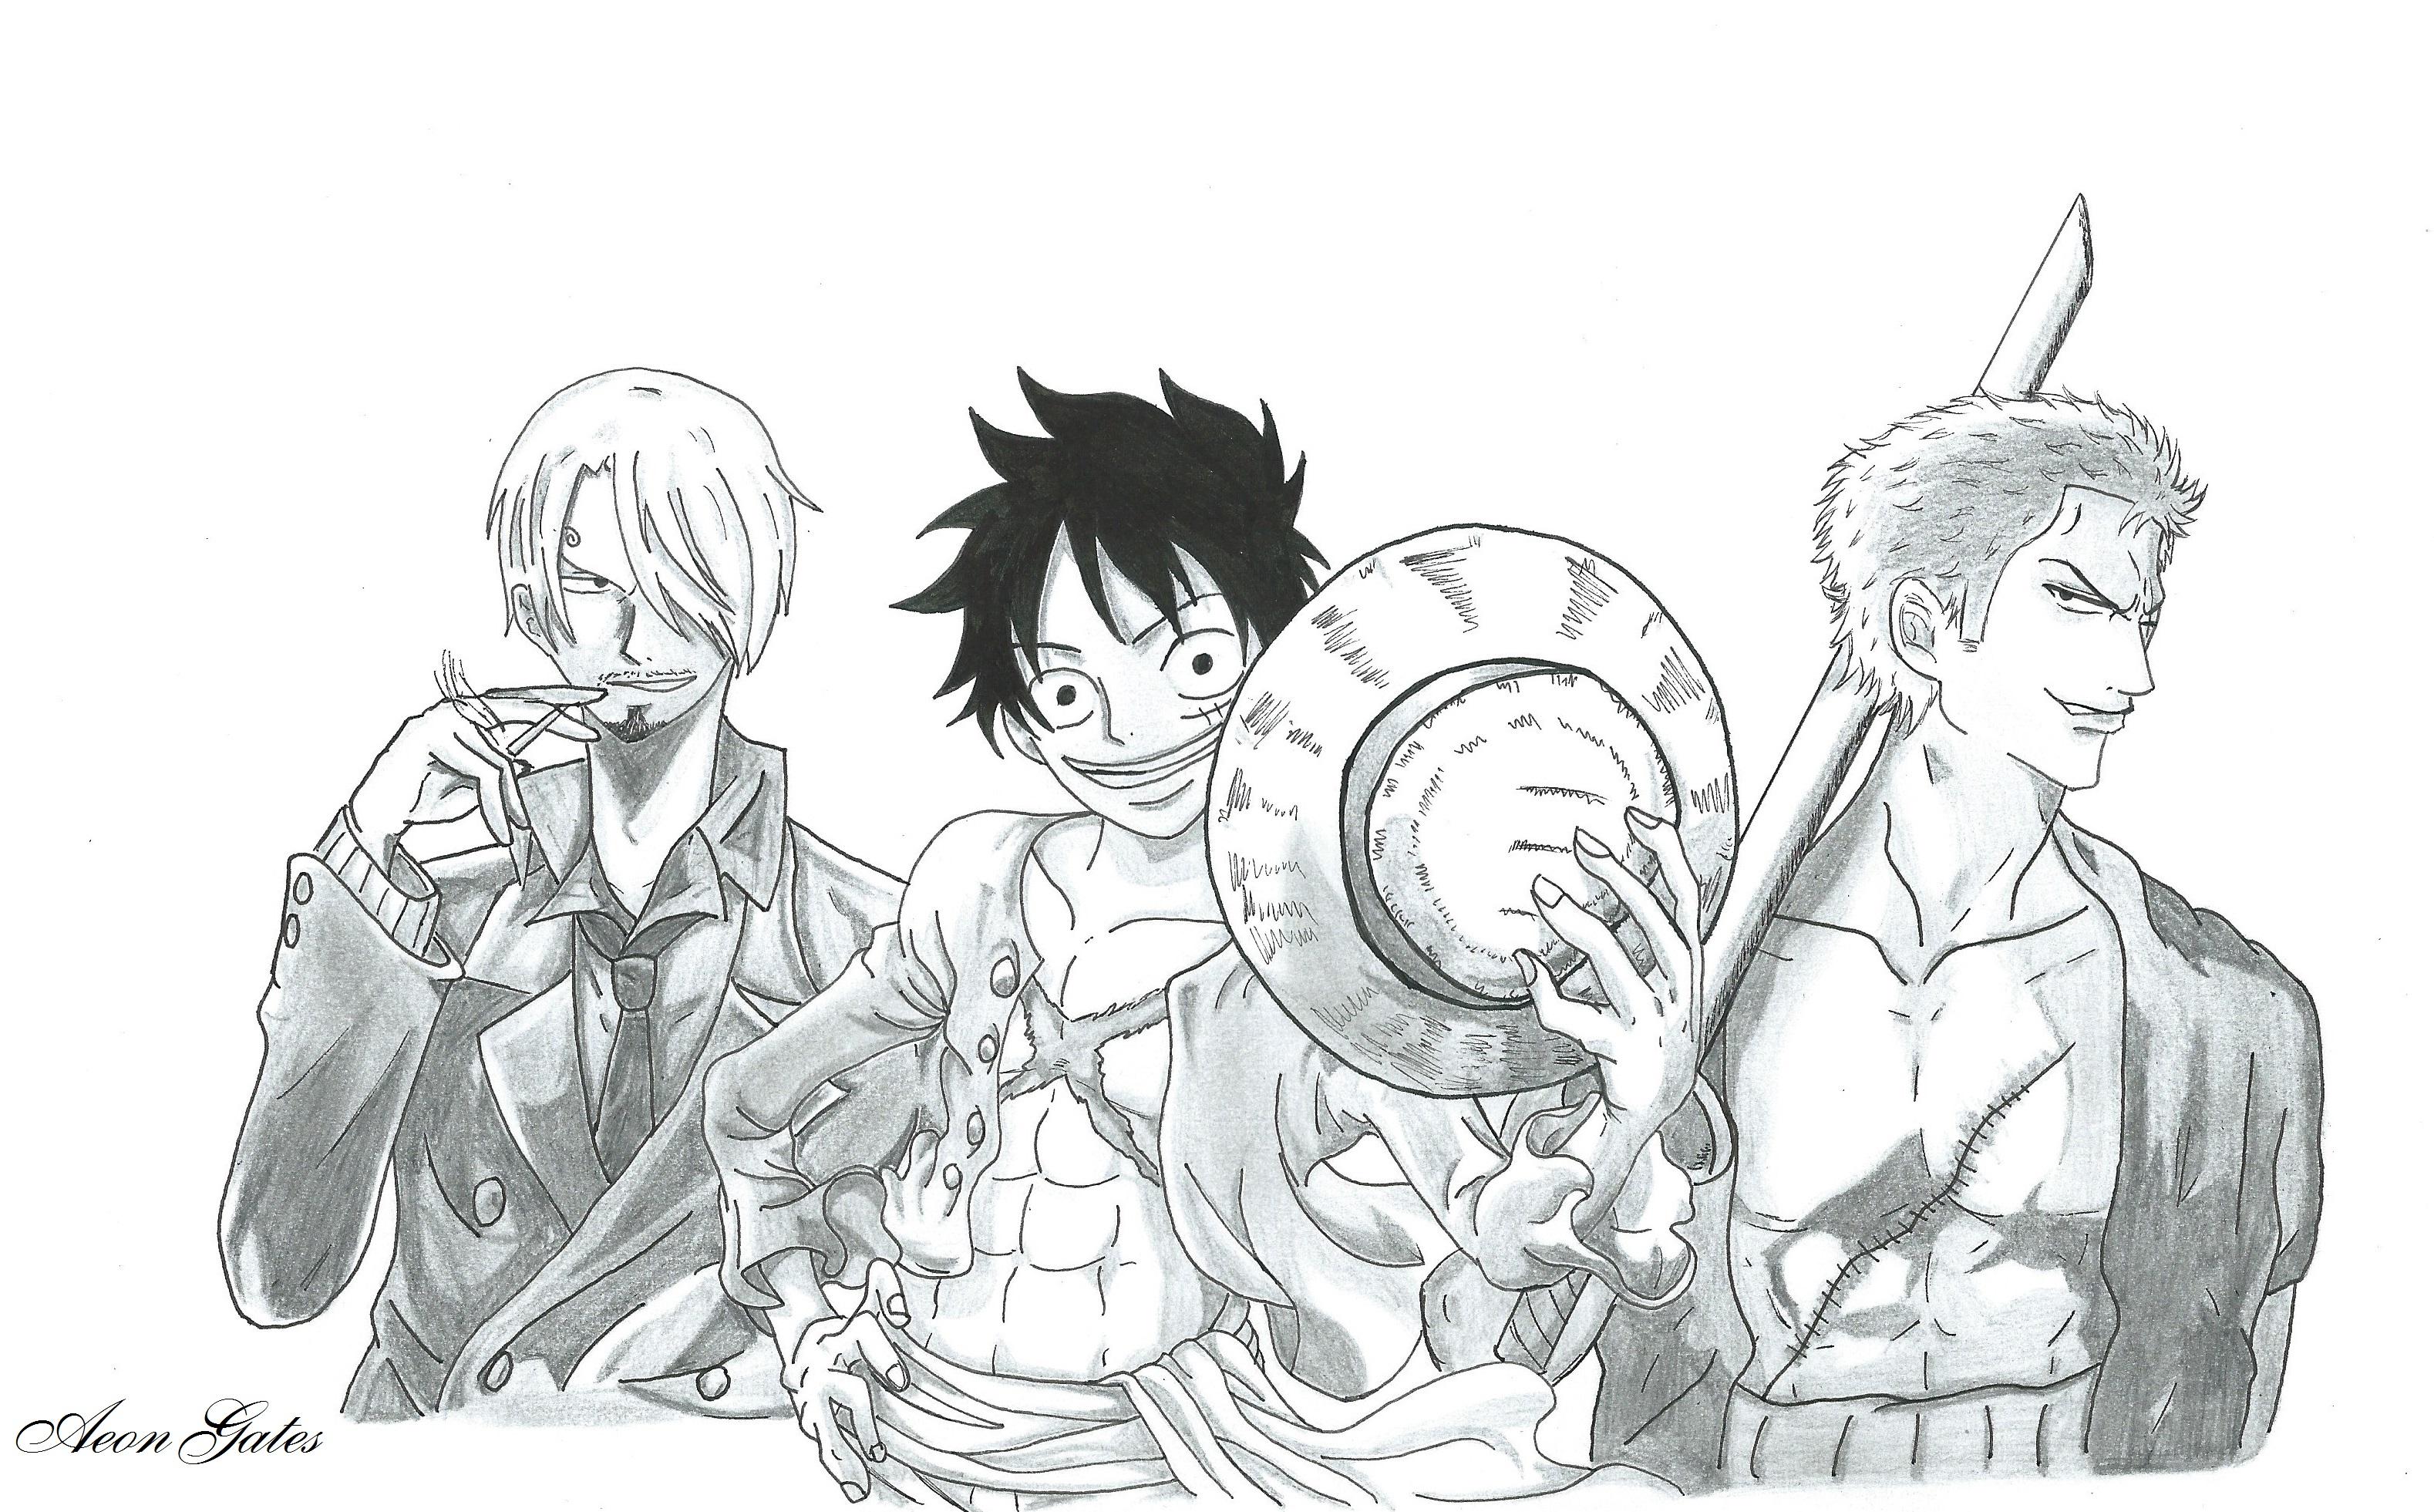 One Piece Sanji Luffy And Zoro By Aeongates On Deviantart